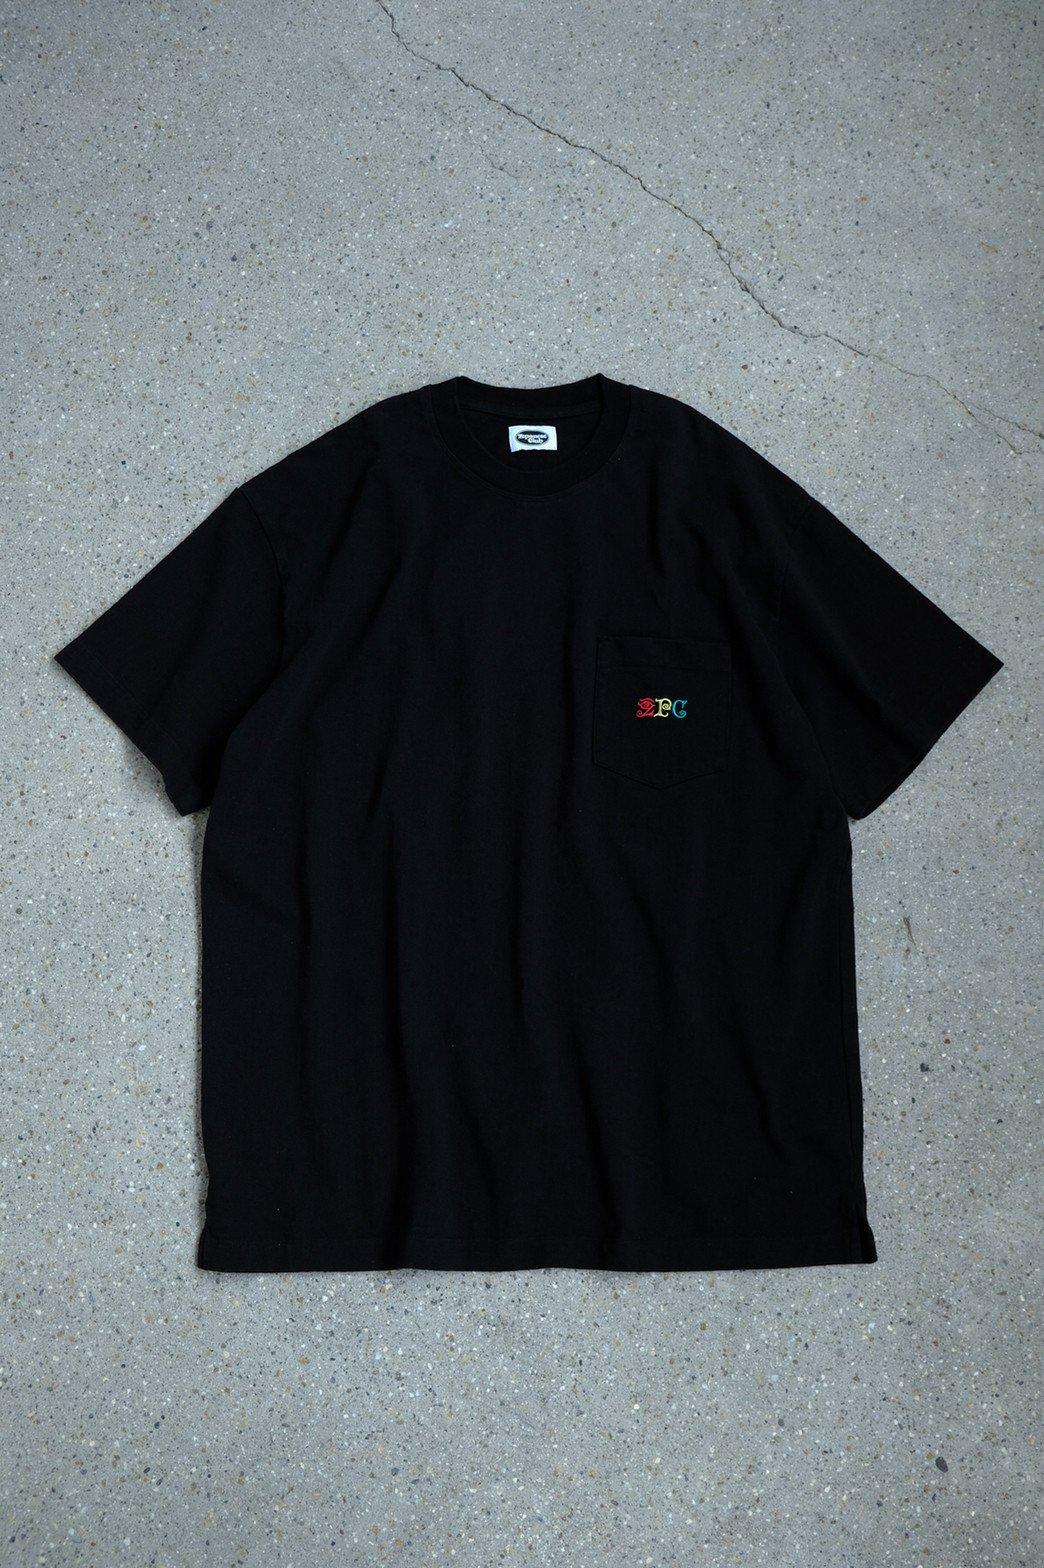 Zepanese Club / 刺繍 SHORT SLEEVE TEE BLACK